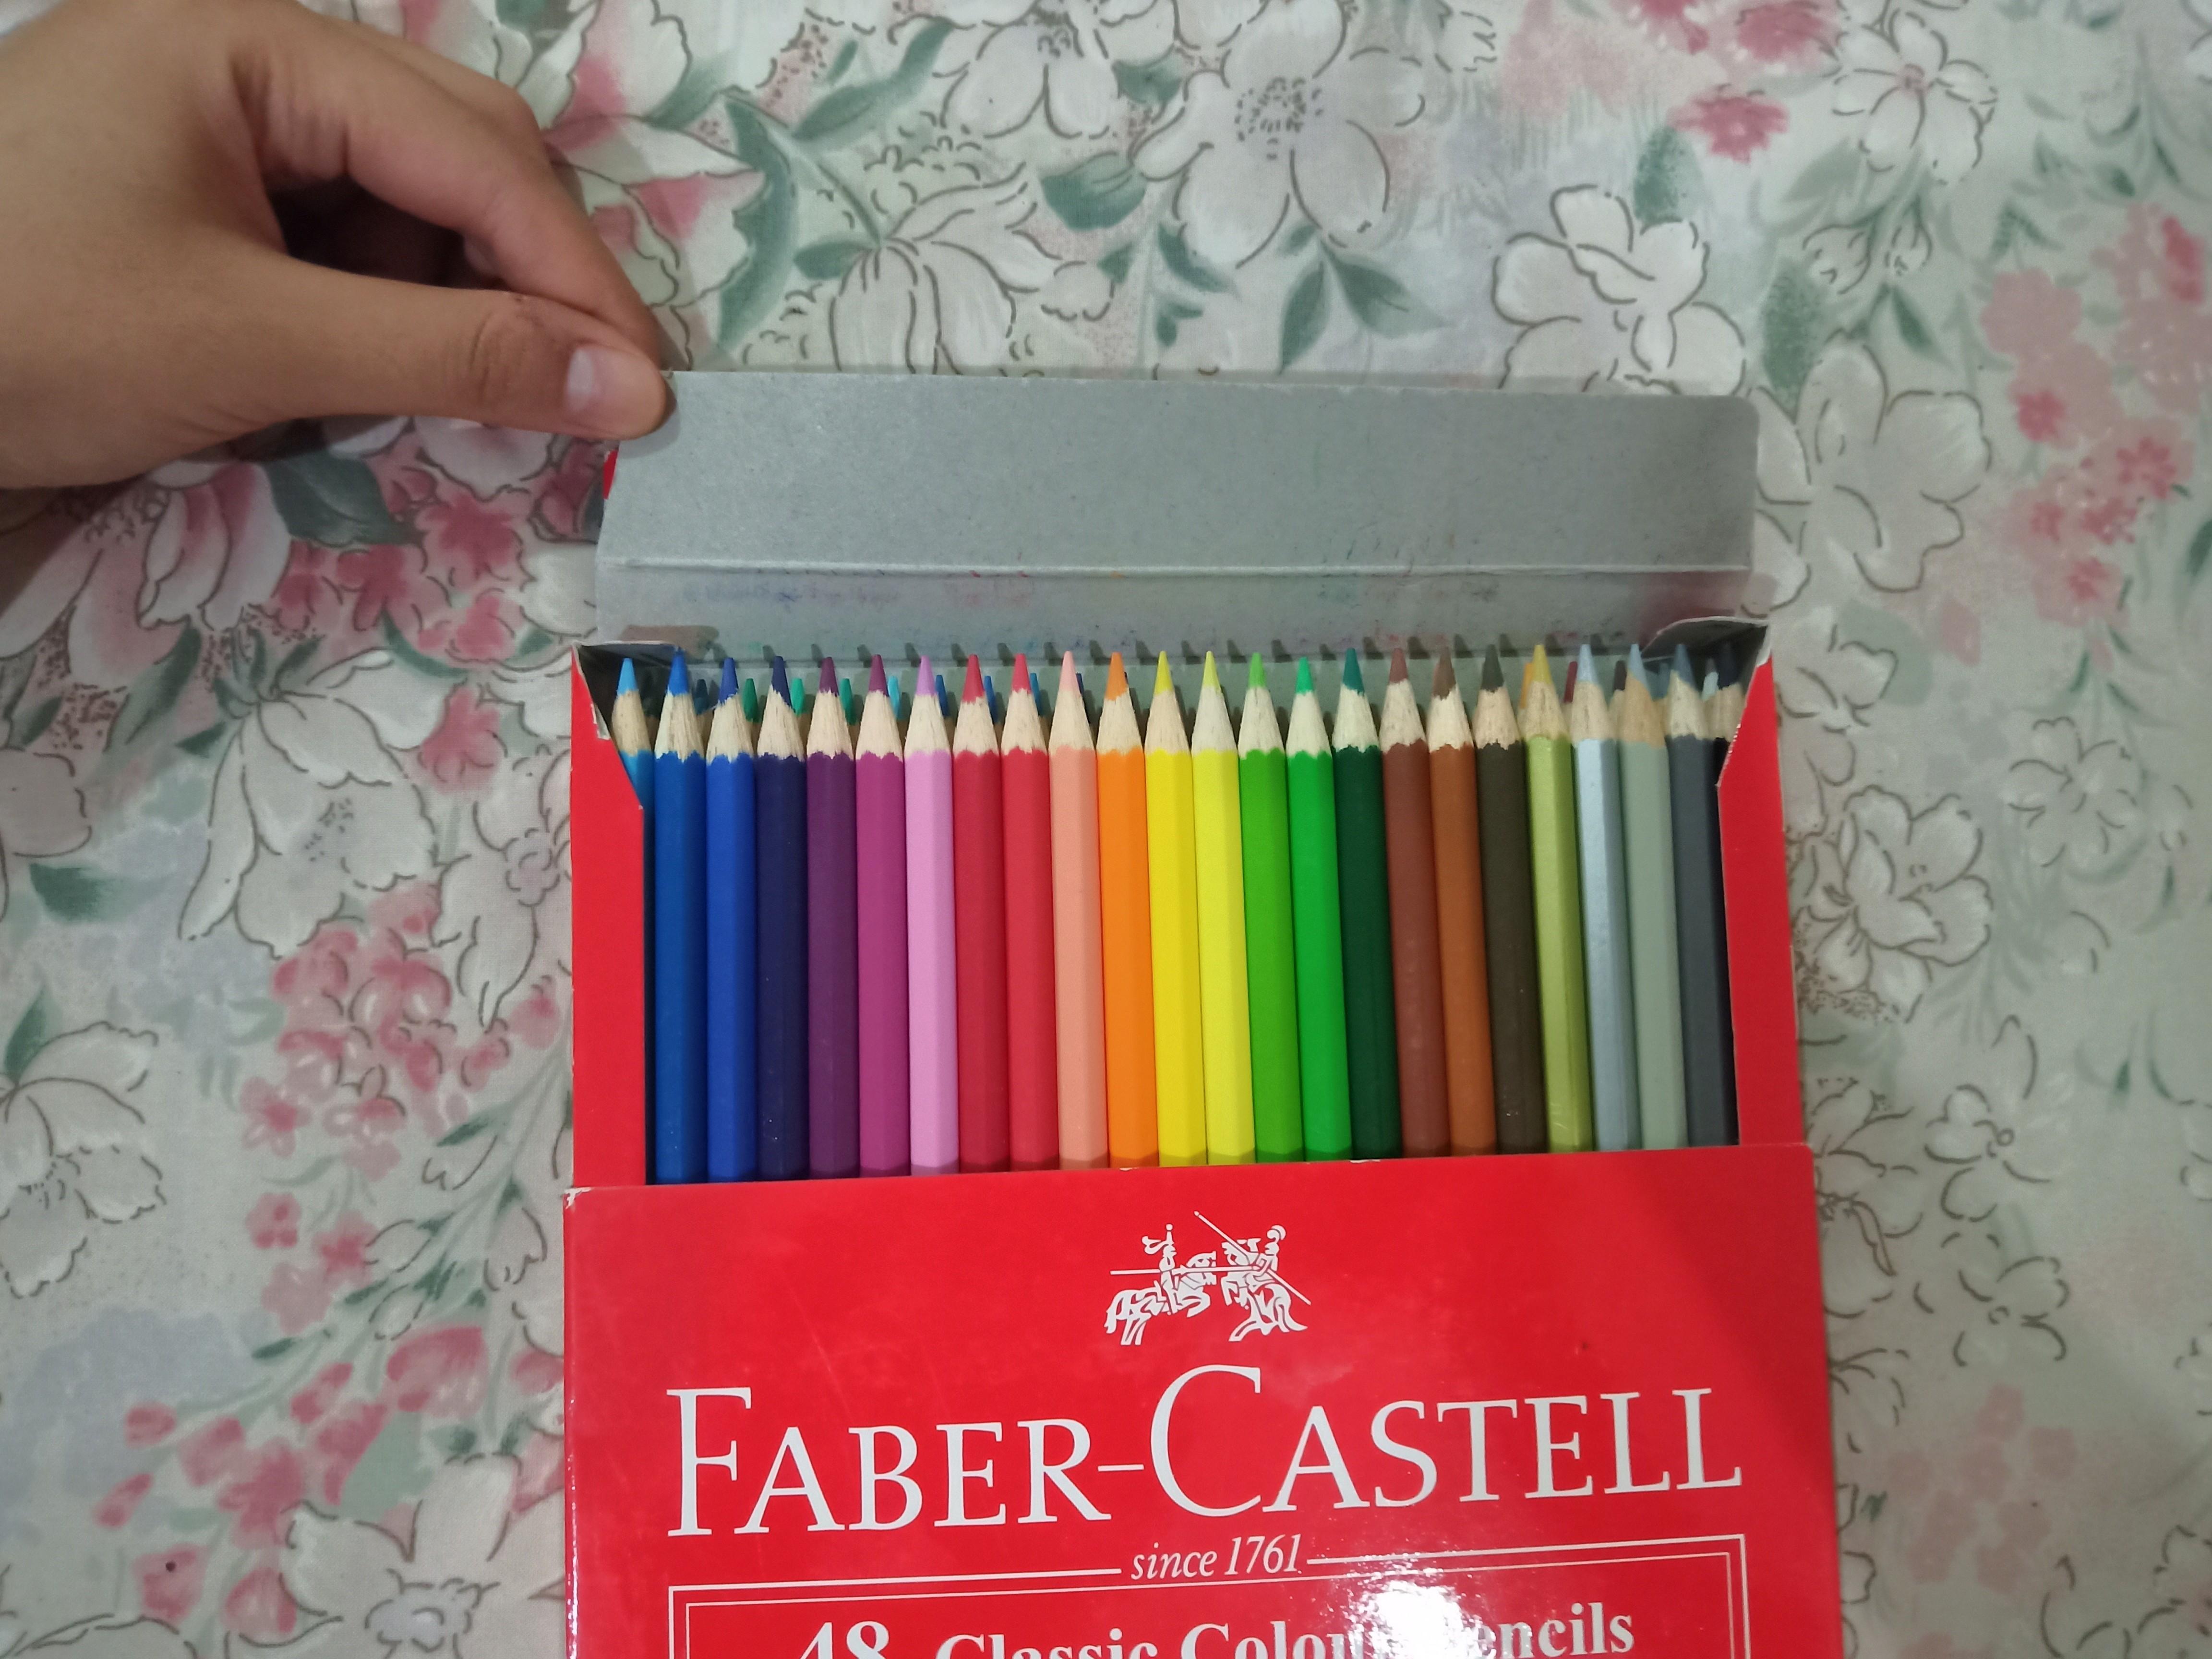 FABER CASTELL Pensil Warna 48 Classic Colour pencils